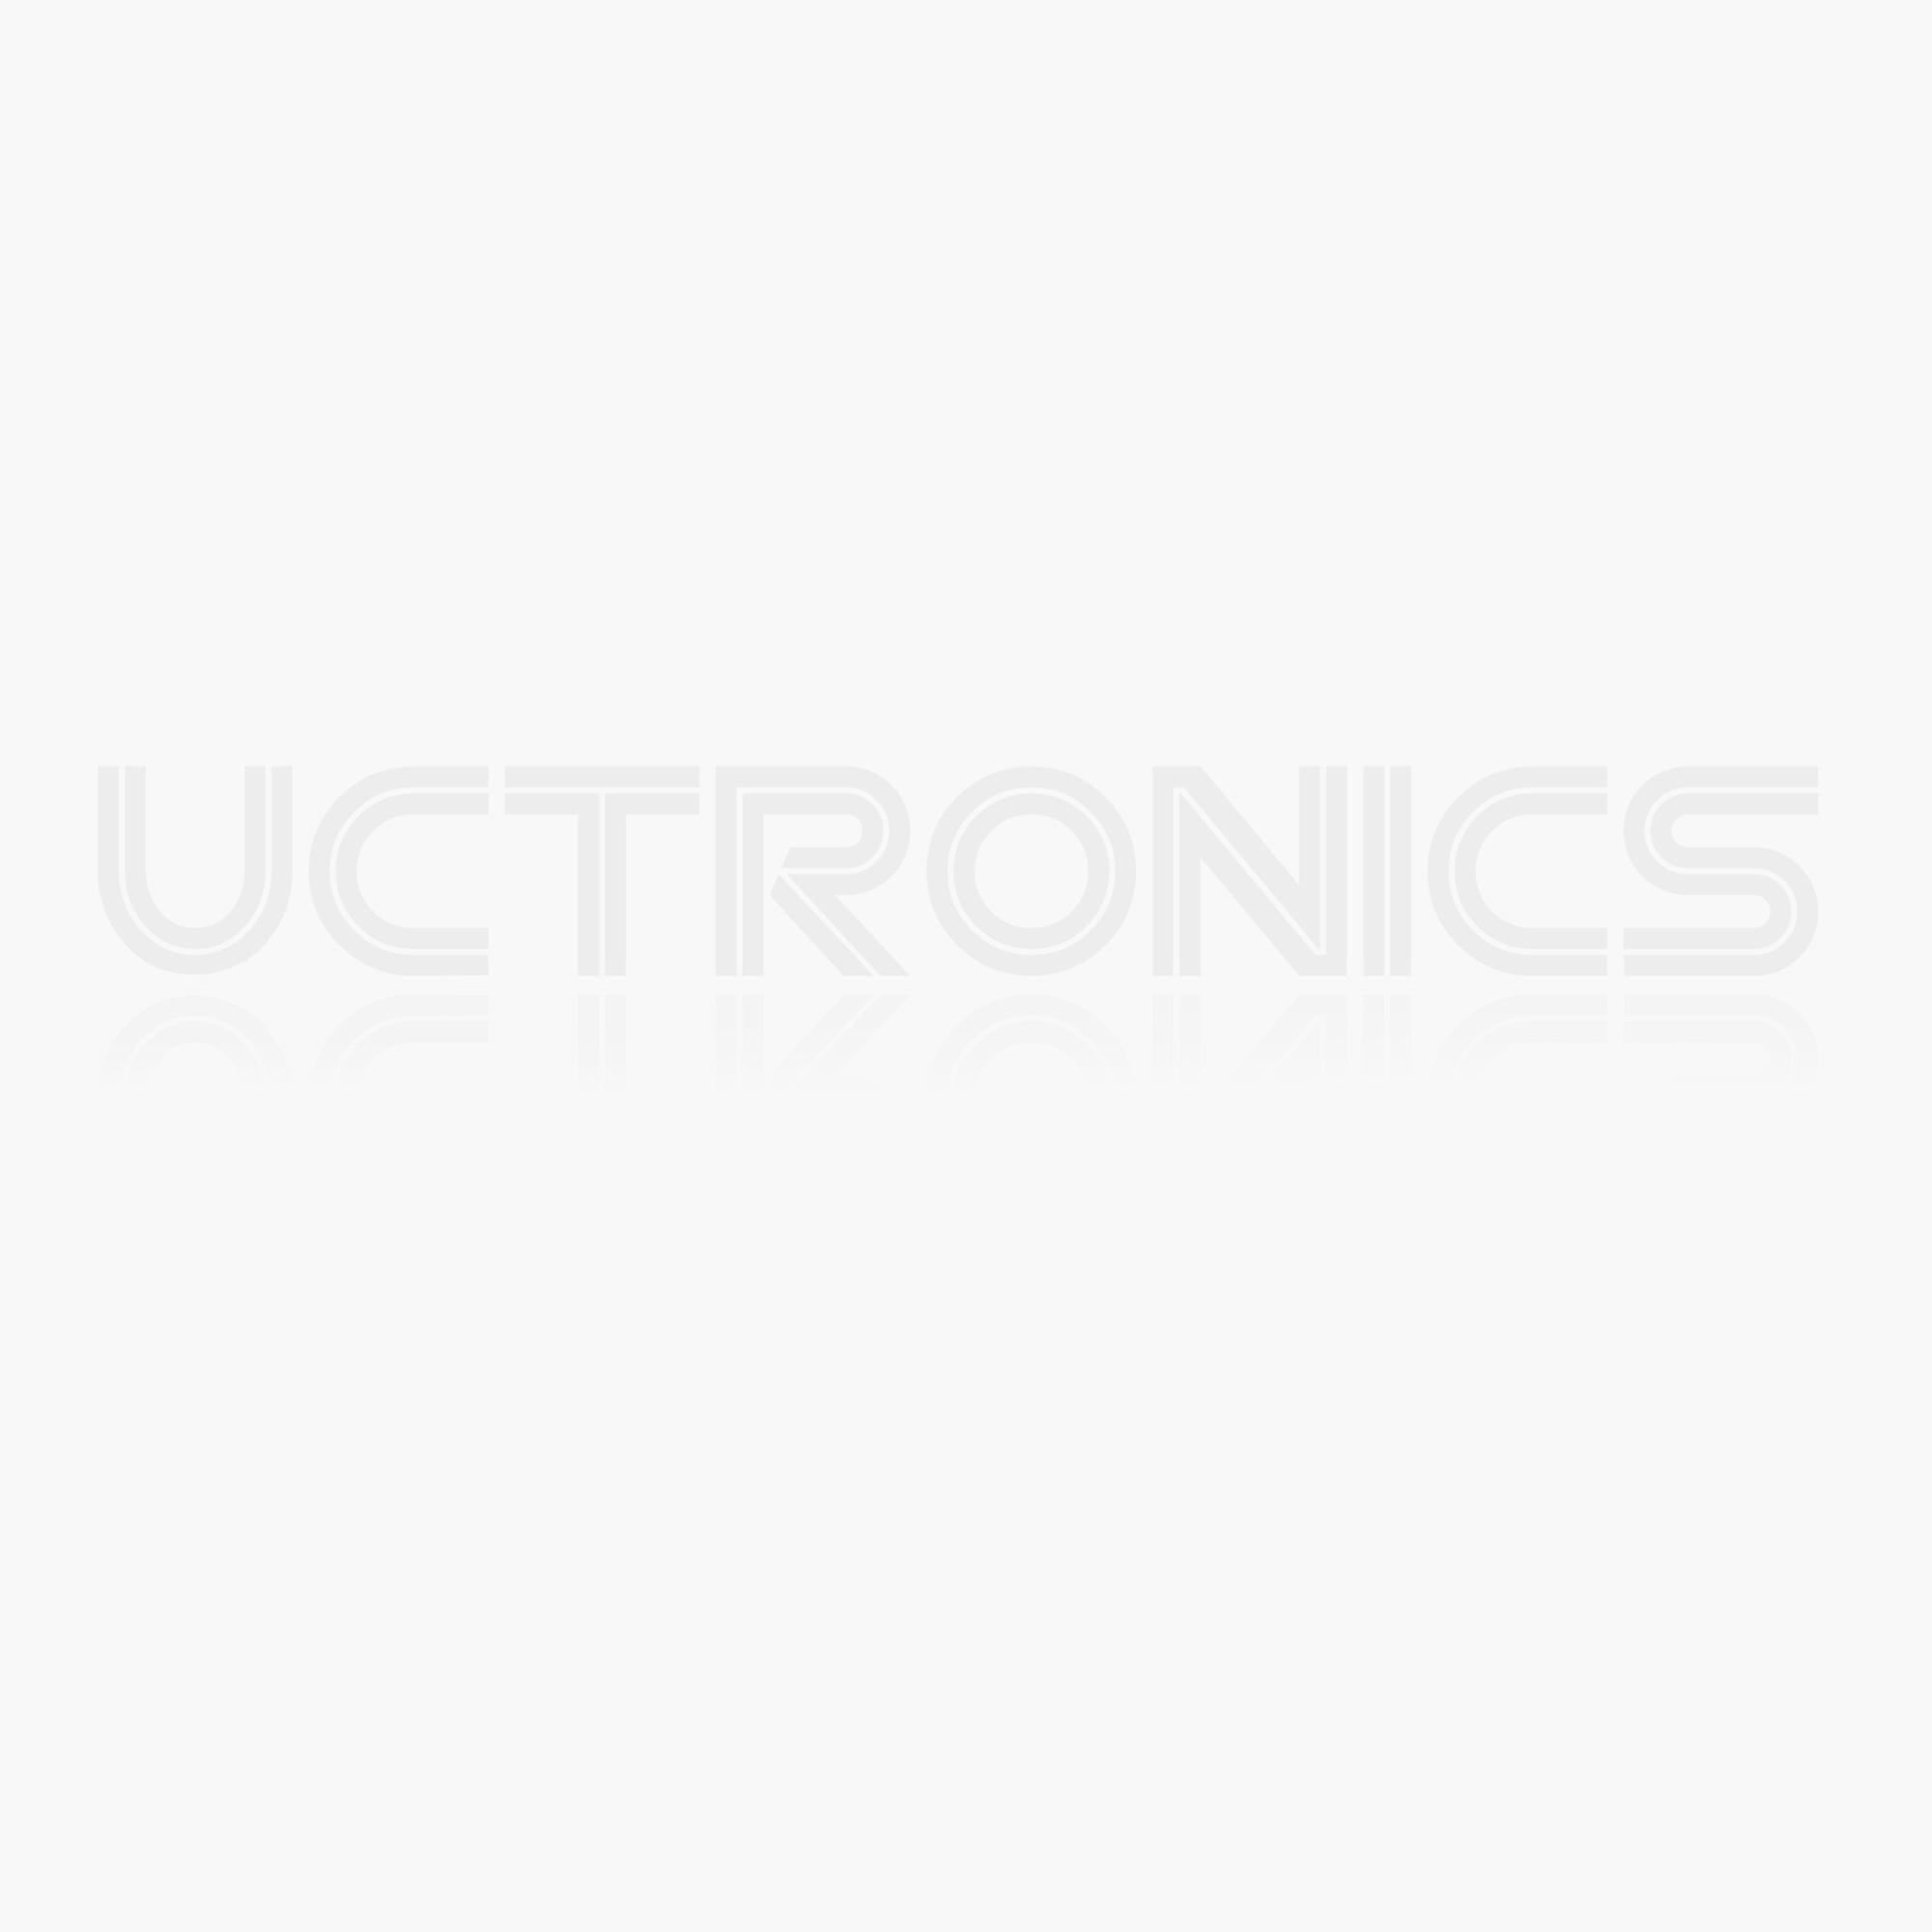 3010 DC 12V Plastic Cooling fans 30*30*10mm for 3D Printer E3D V5 V6